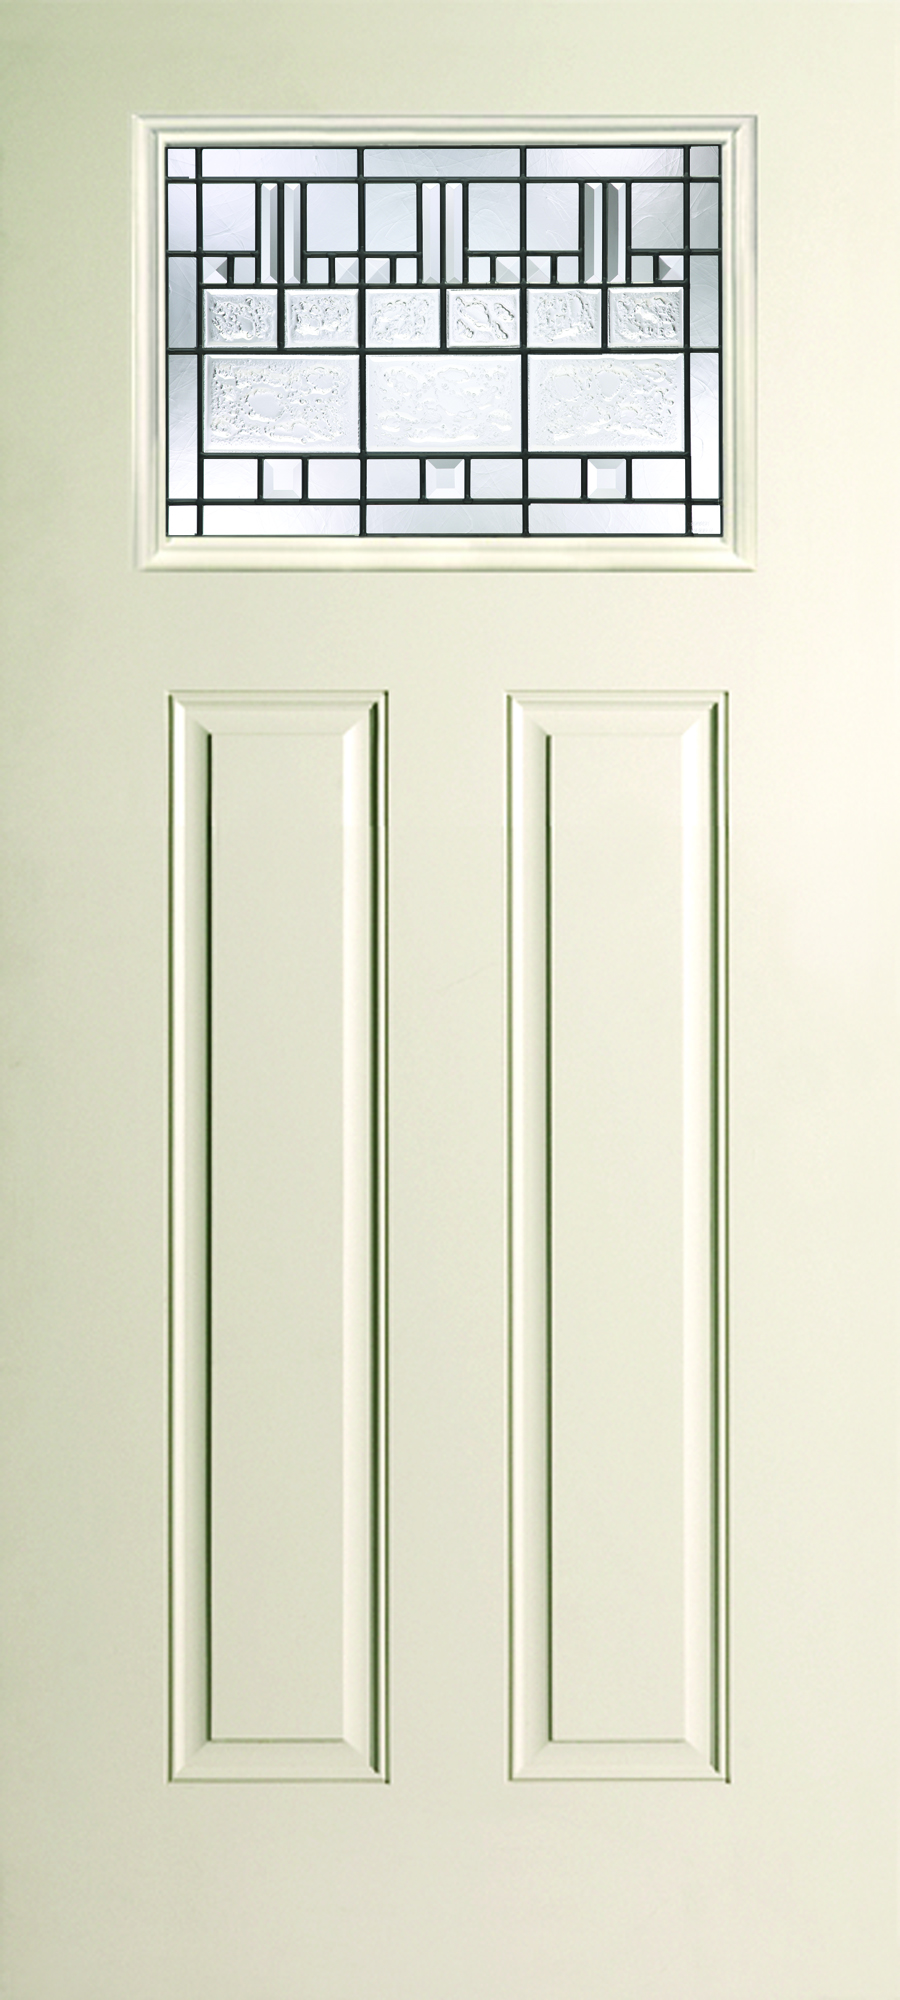 Therma tru sedona 21 x 15 glass and frame for Therma tru fiber classic mahogany price